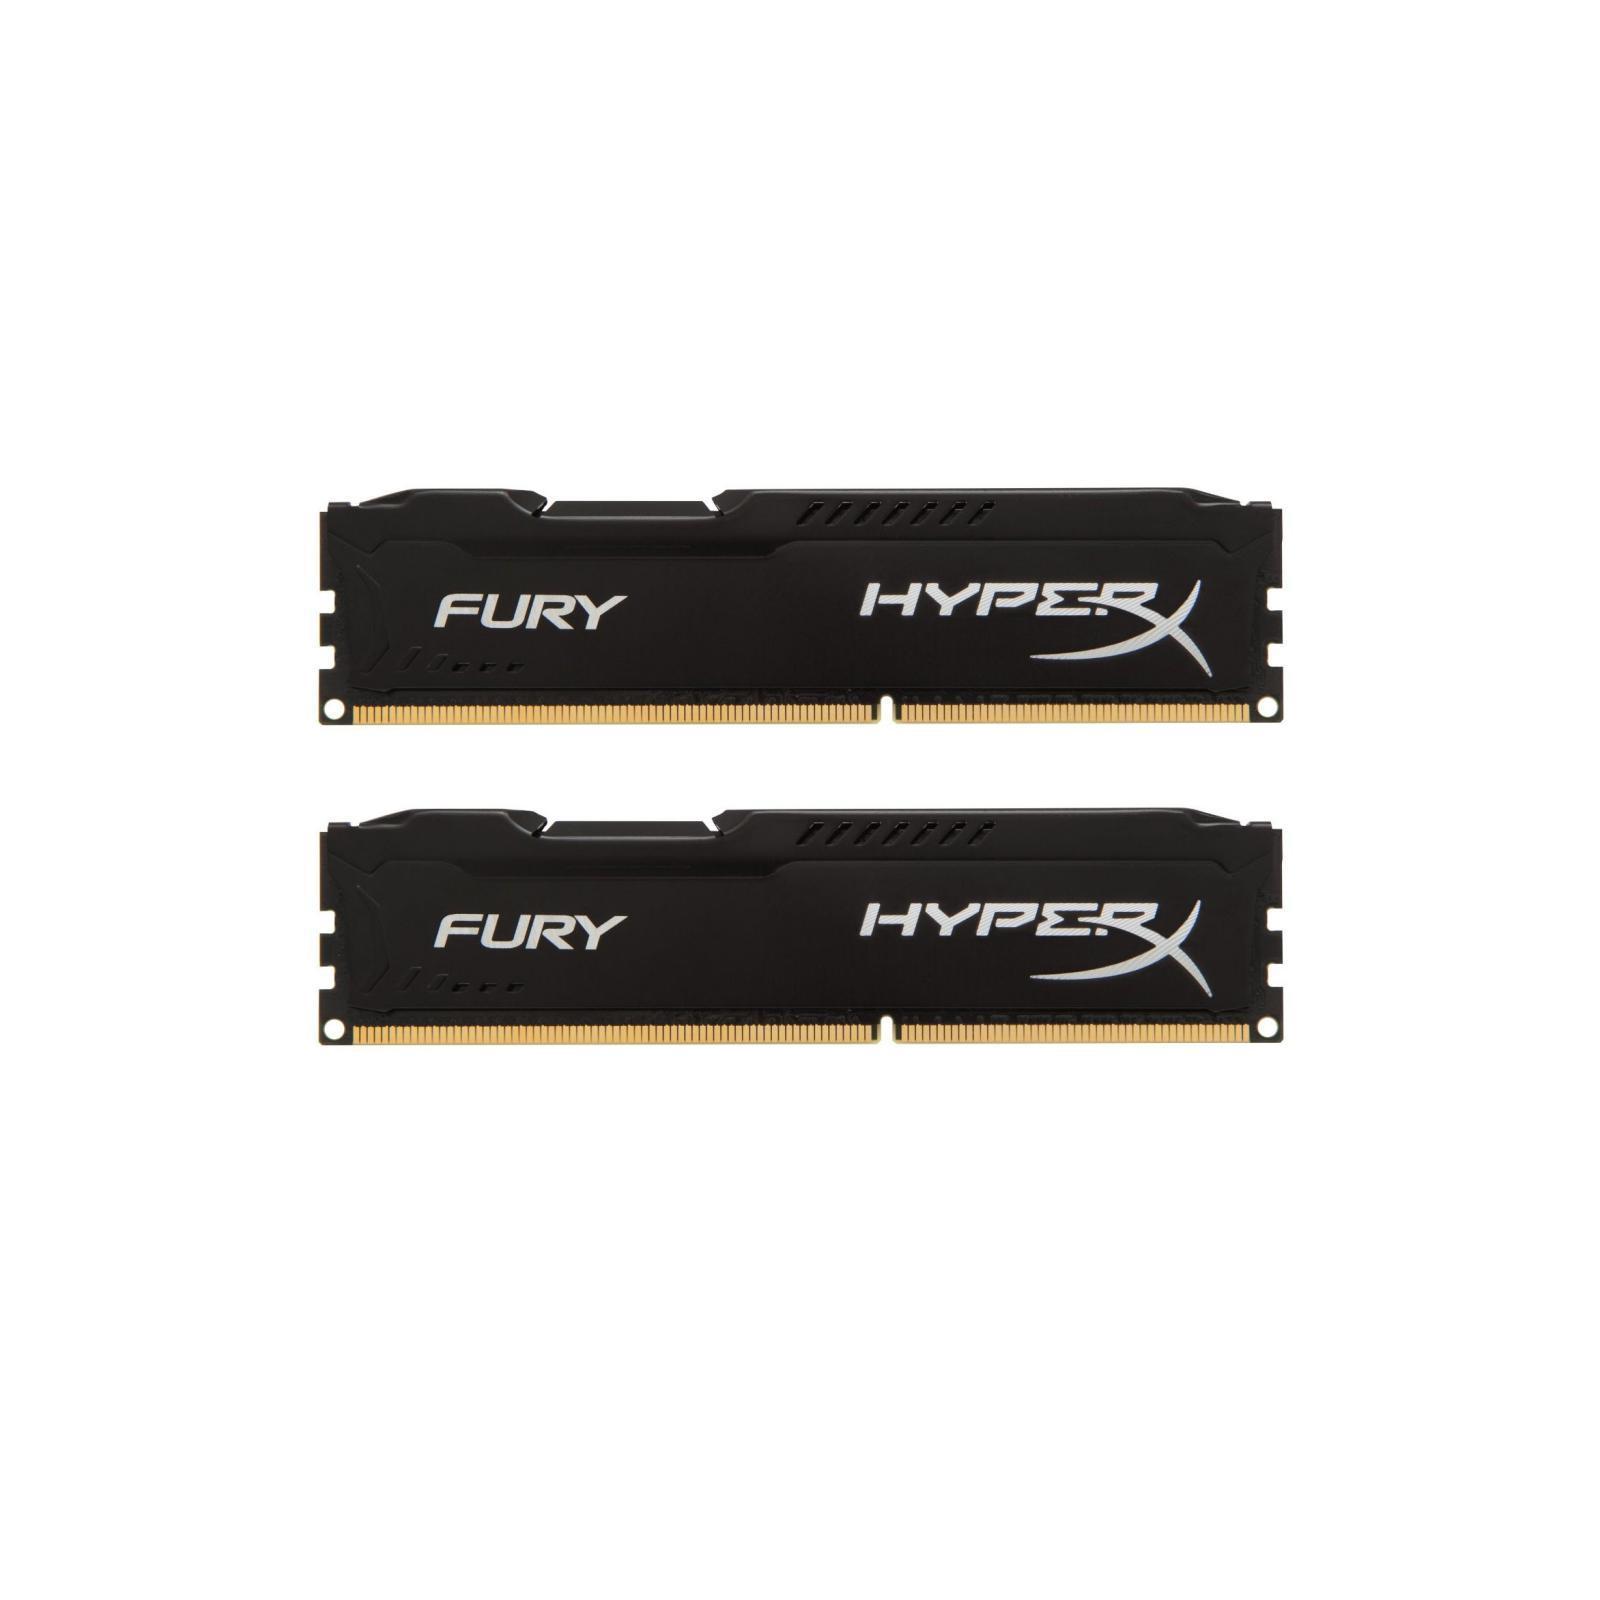 Модуль памяти для компьютера DDR4 32GB (2x16GB) 3466 MHz HyperX FURY Black HyperX (Kingston Fury) (HX434C19FBK2/32)